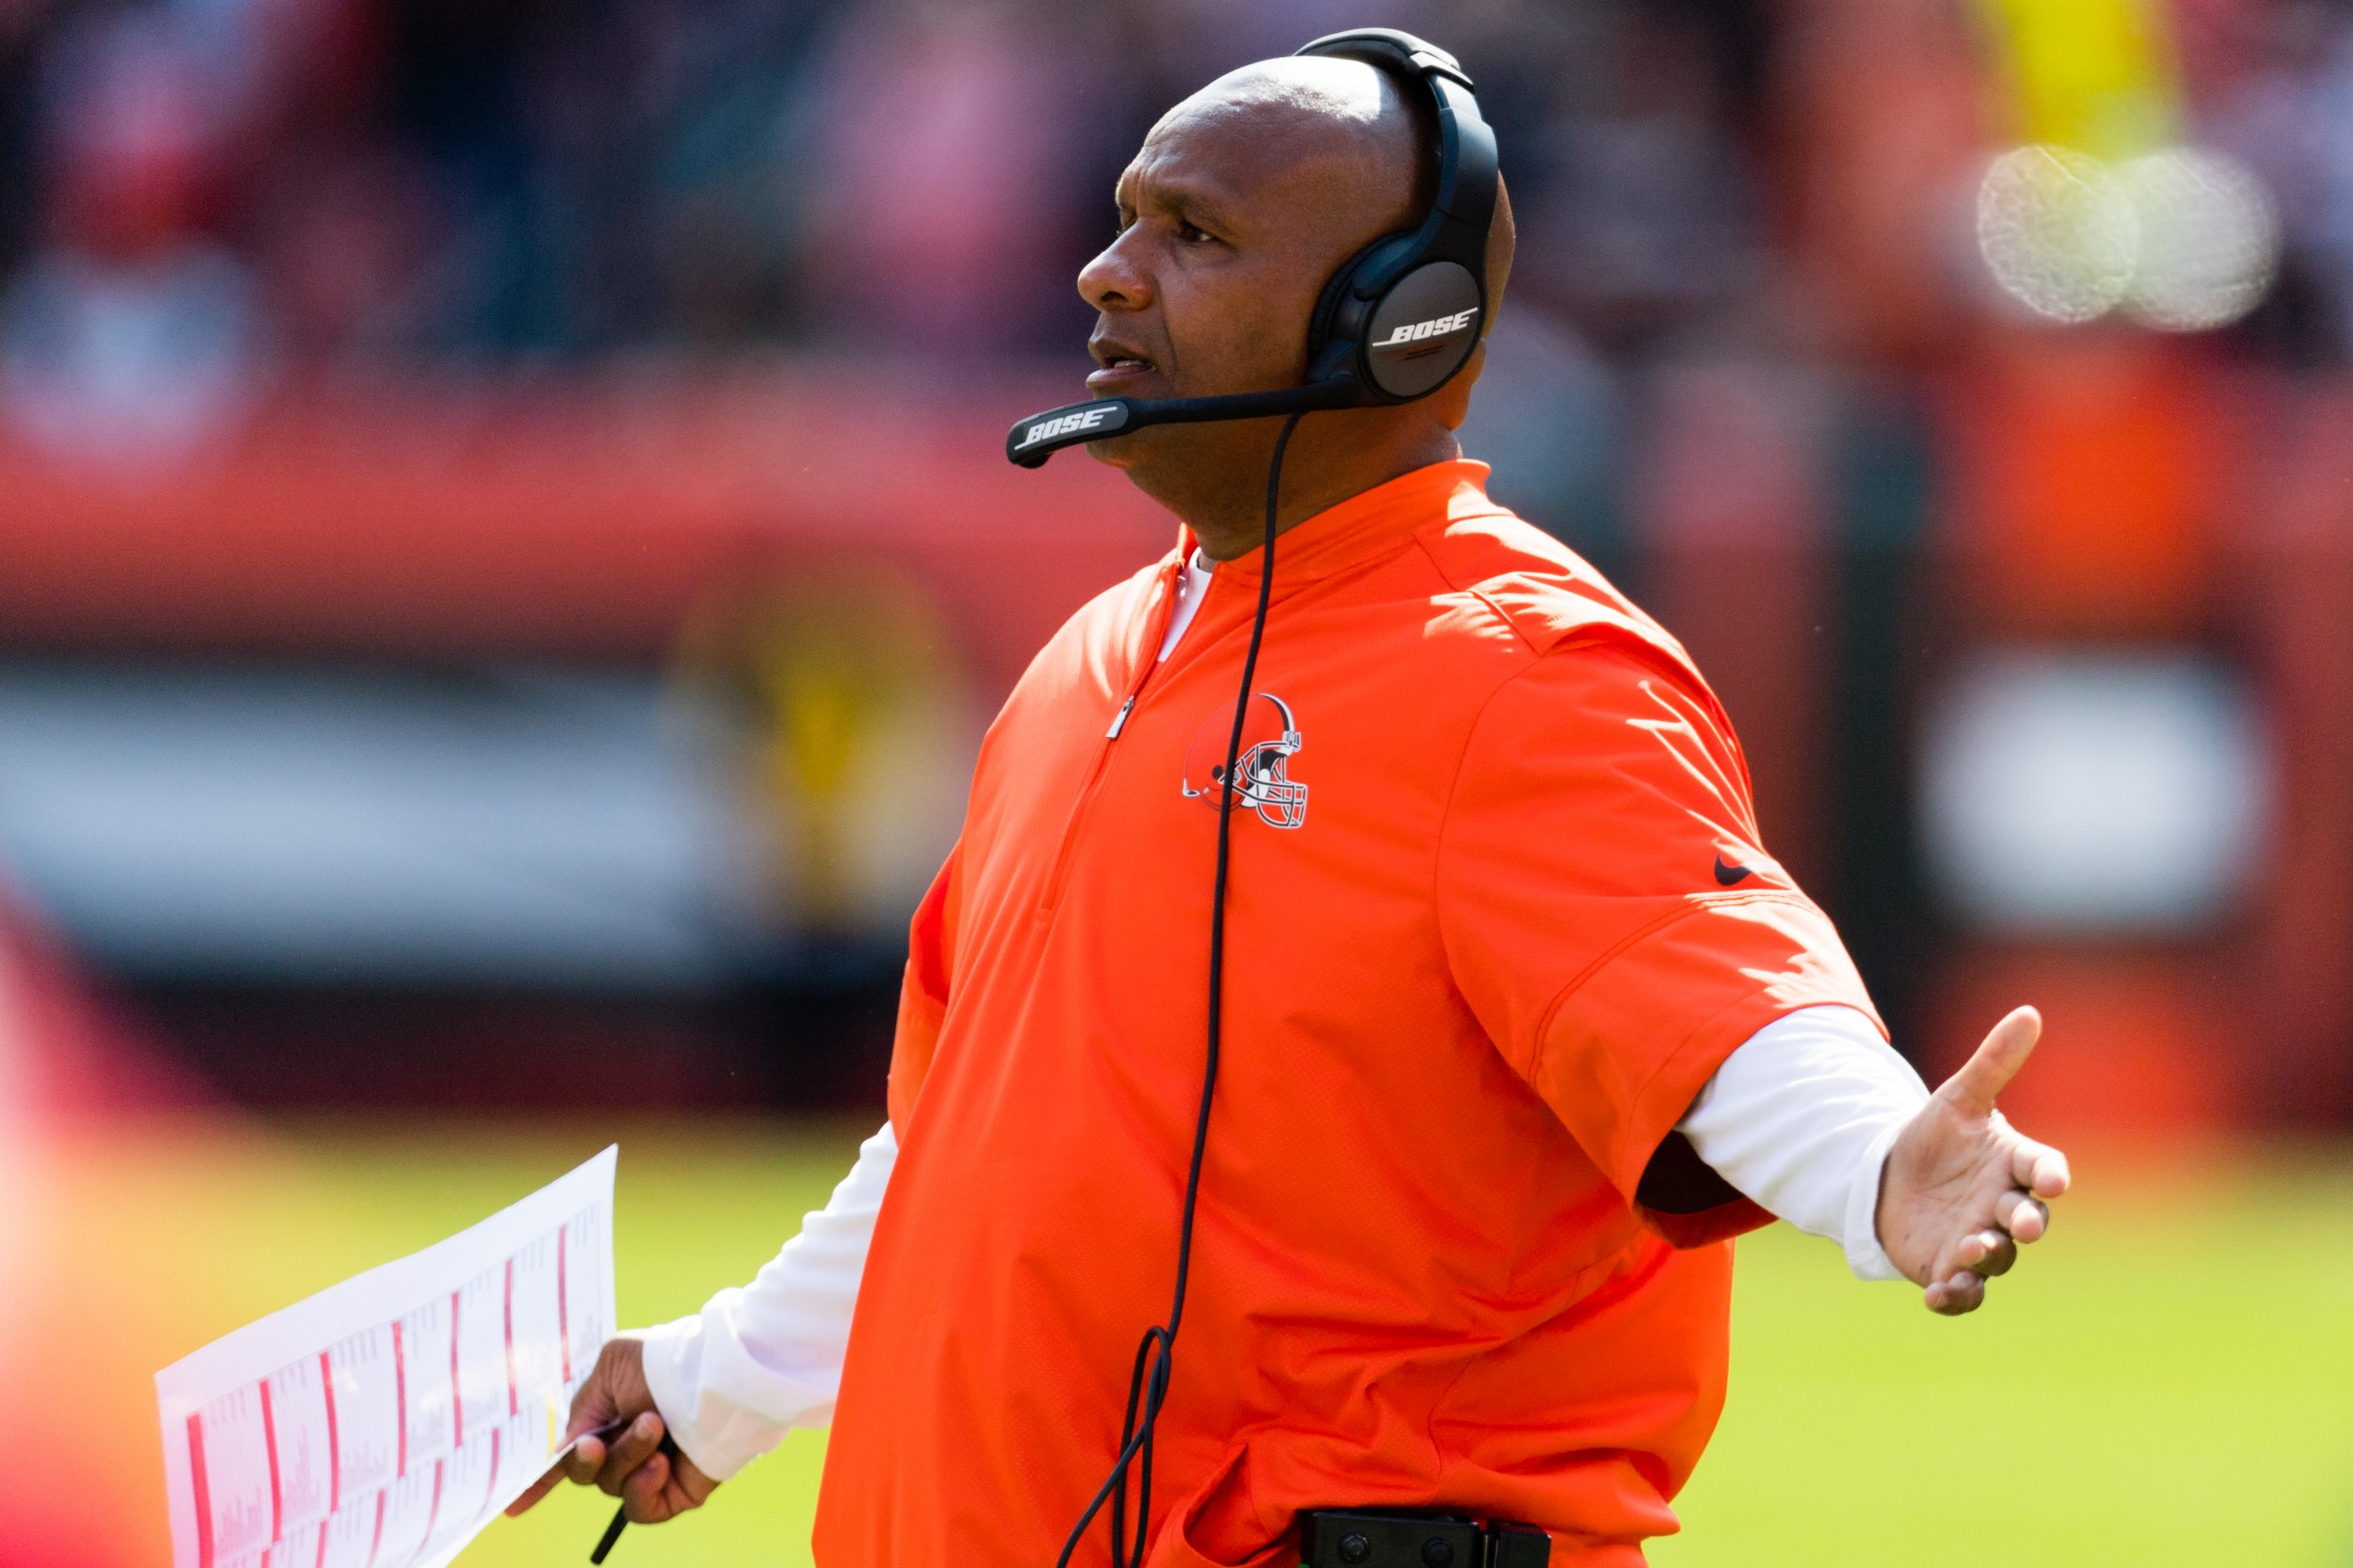 Cleveland Browns head coach Hue Jackson.